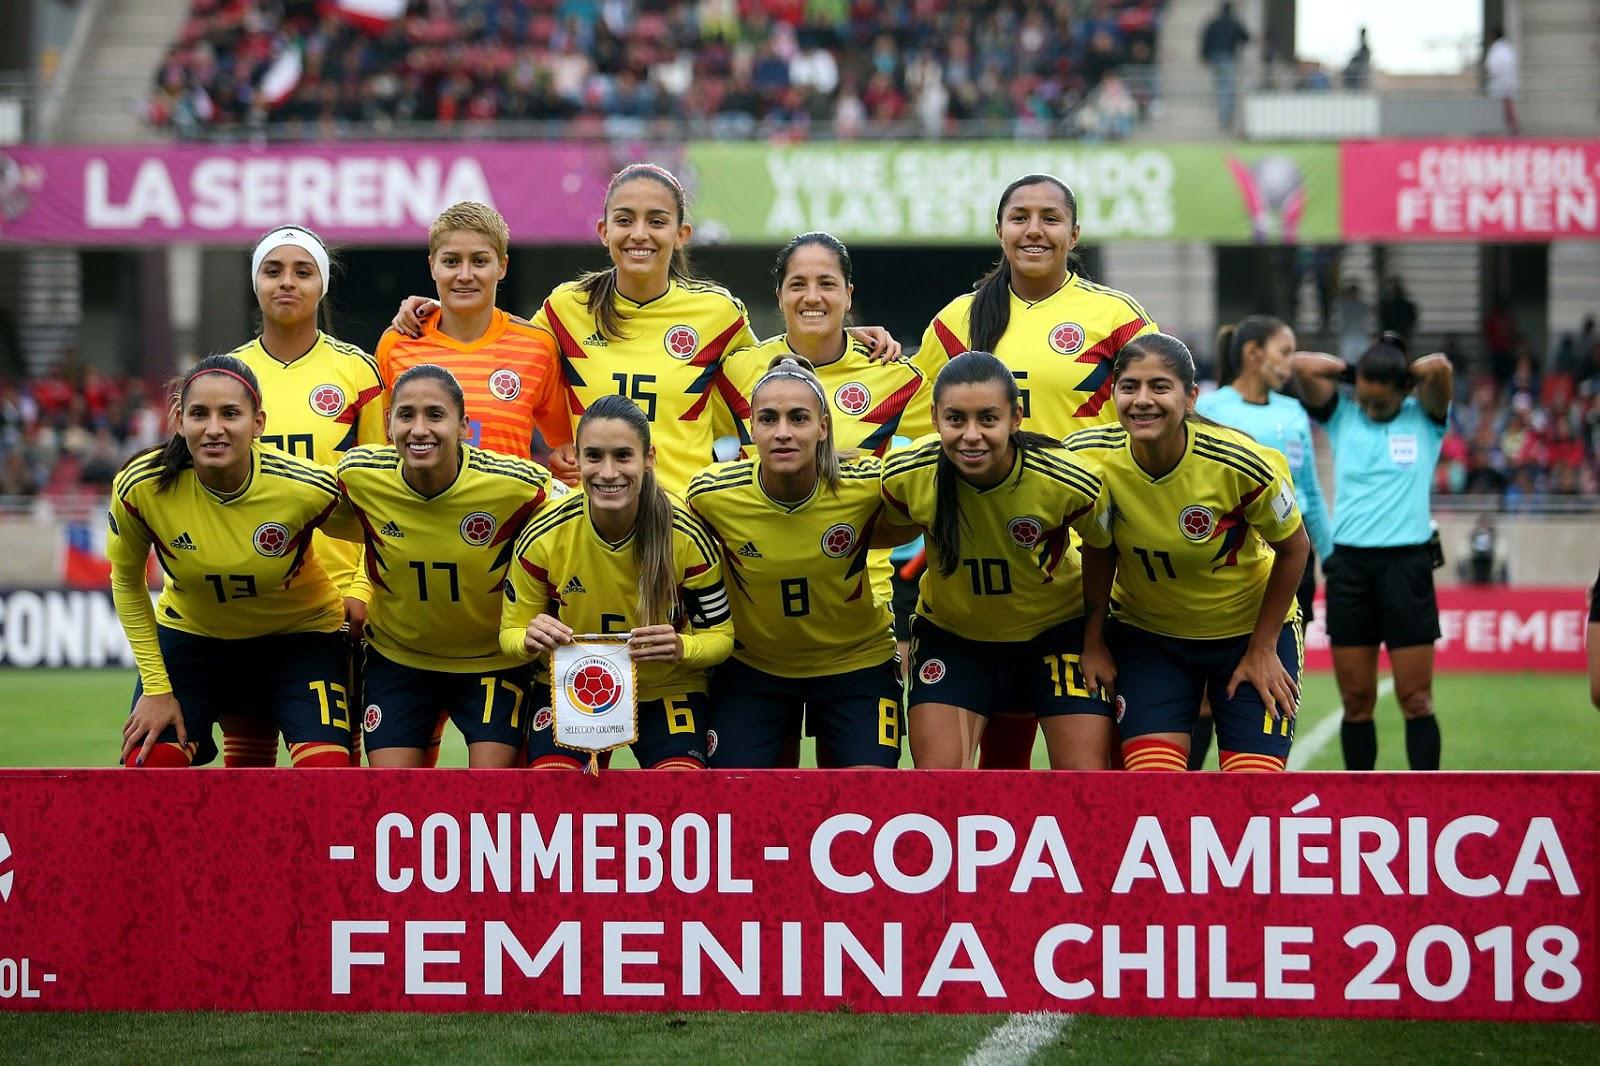 Formación de selección de Colombia ante Chile, Copa América Femenina 2018, 6 de abril